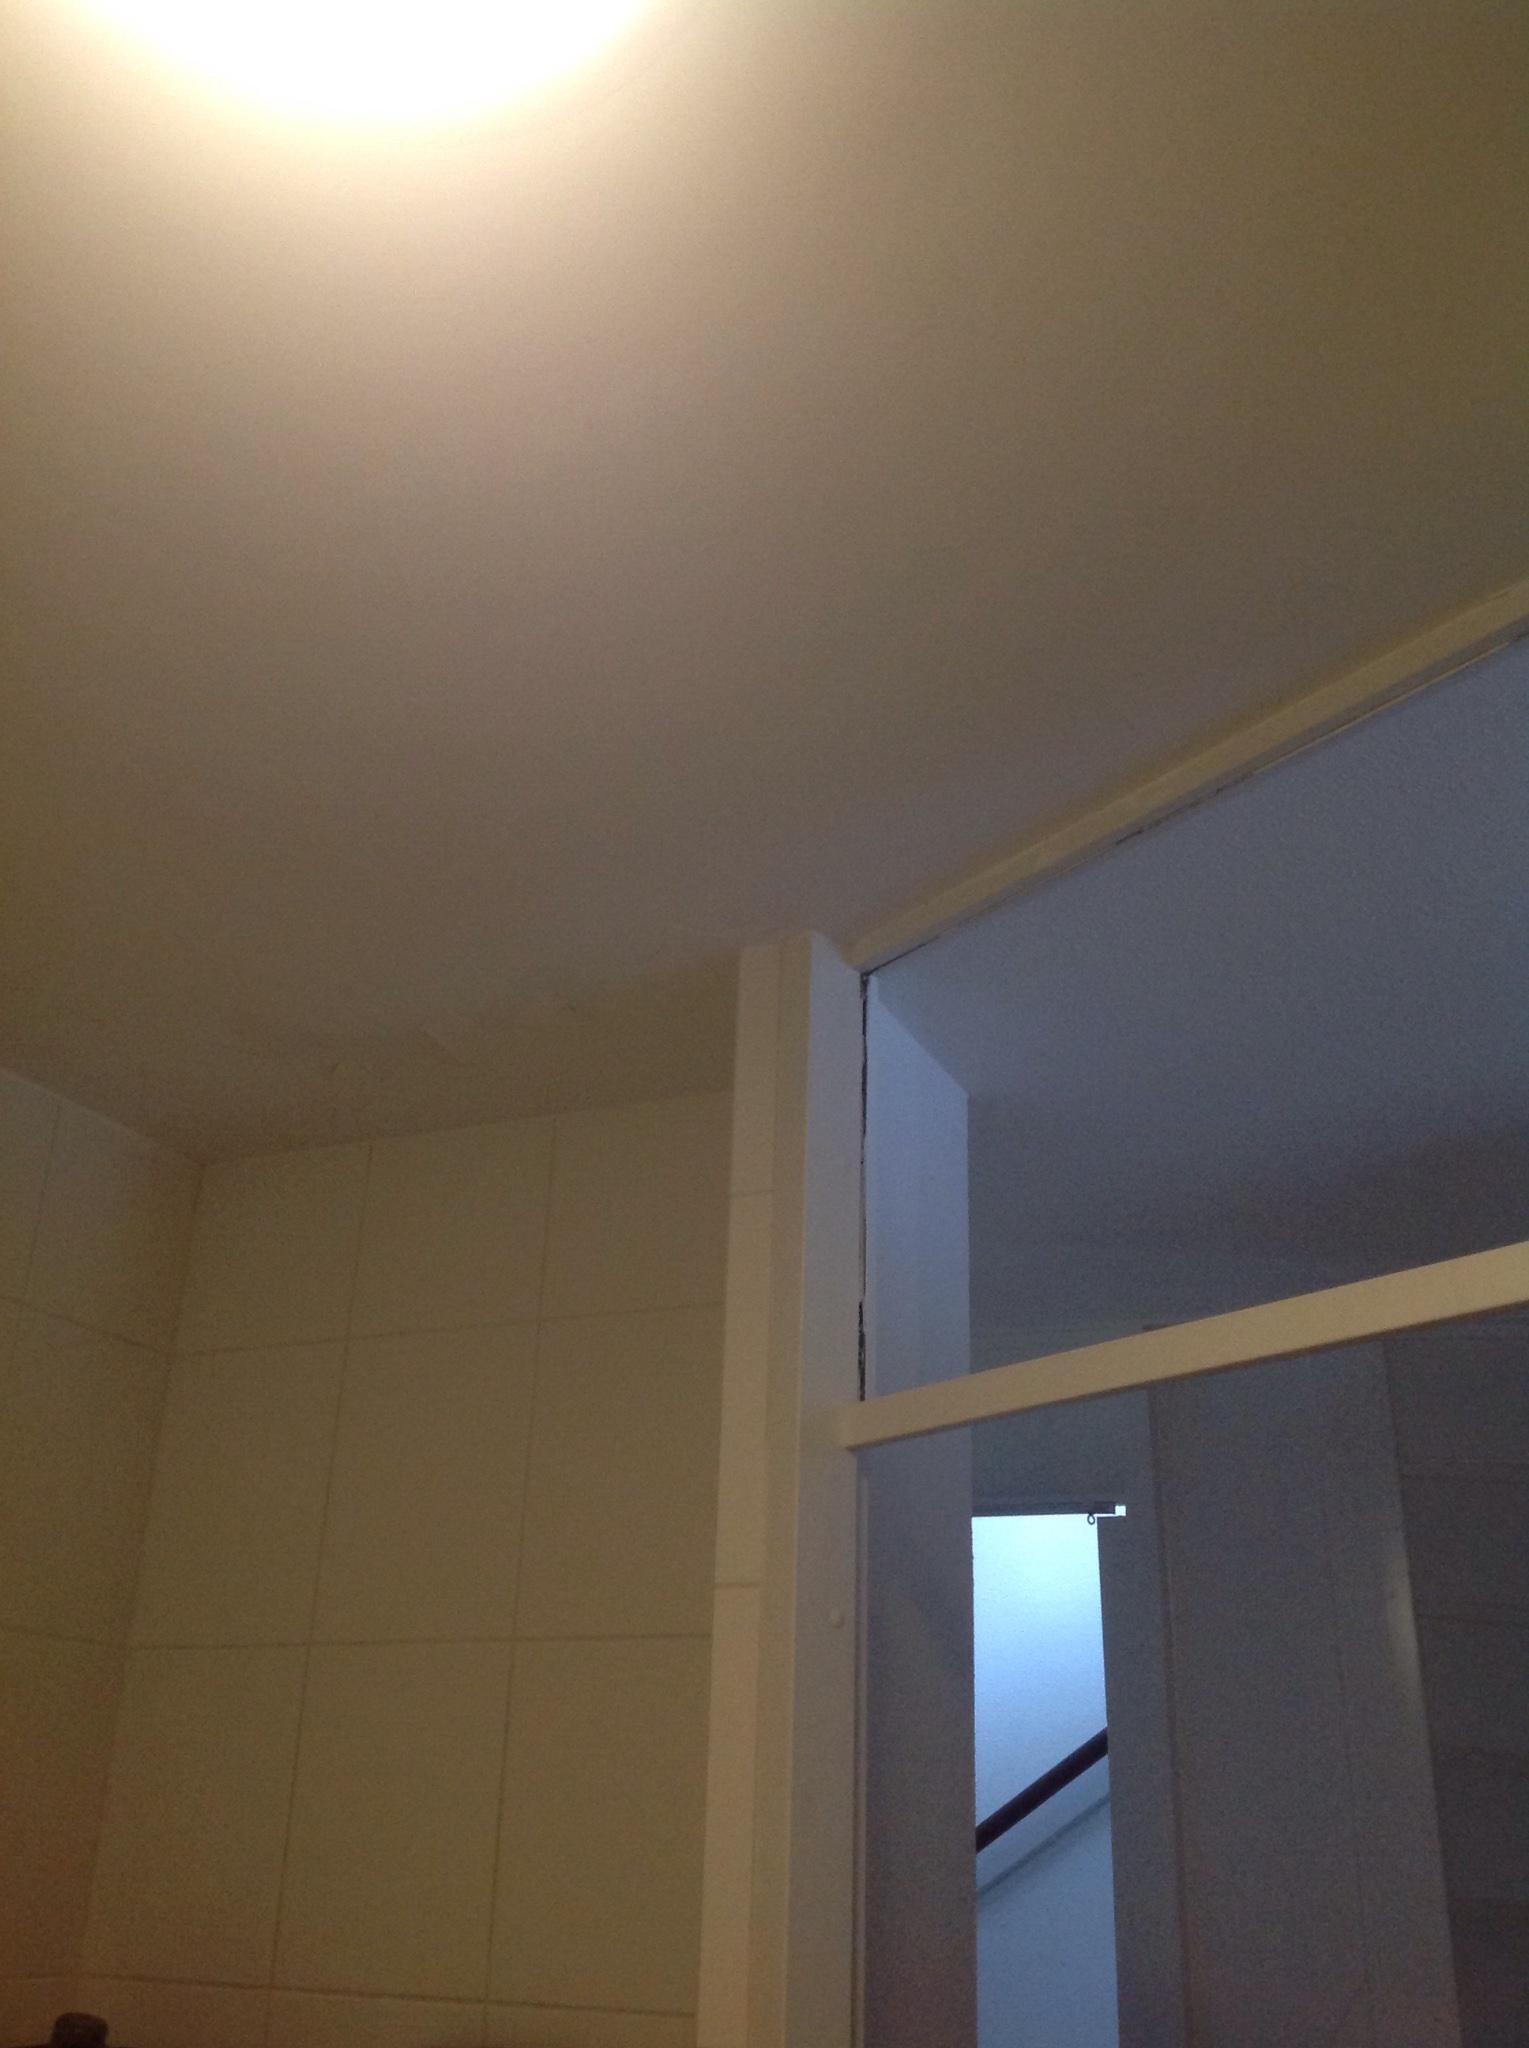 Verlaagd plafond in badkamer maken (incl verlichting) - Werkspot